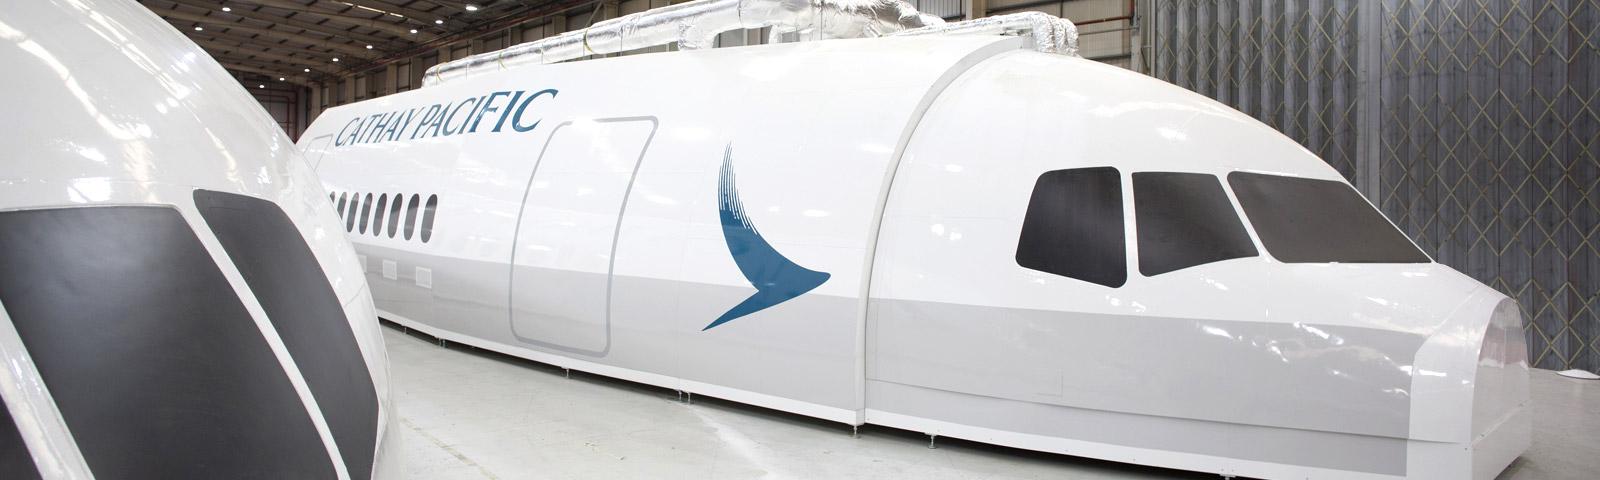 <h1>可靠的大價值機艙乘員訓練模擬器</h1><a href='/zh/civil-aviation/door-trainers/'>找到更多</a>